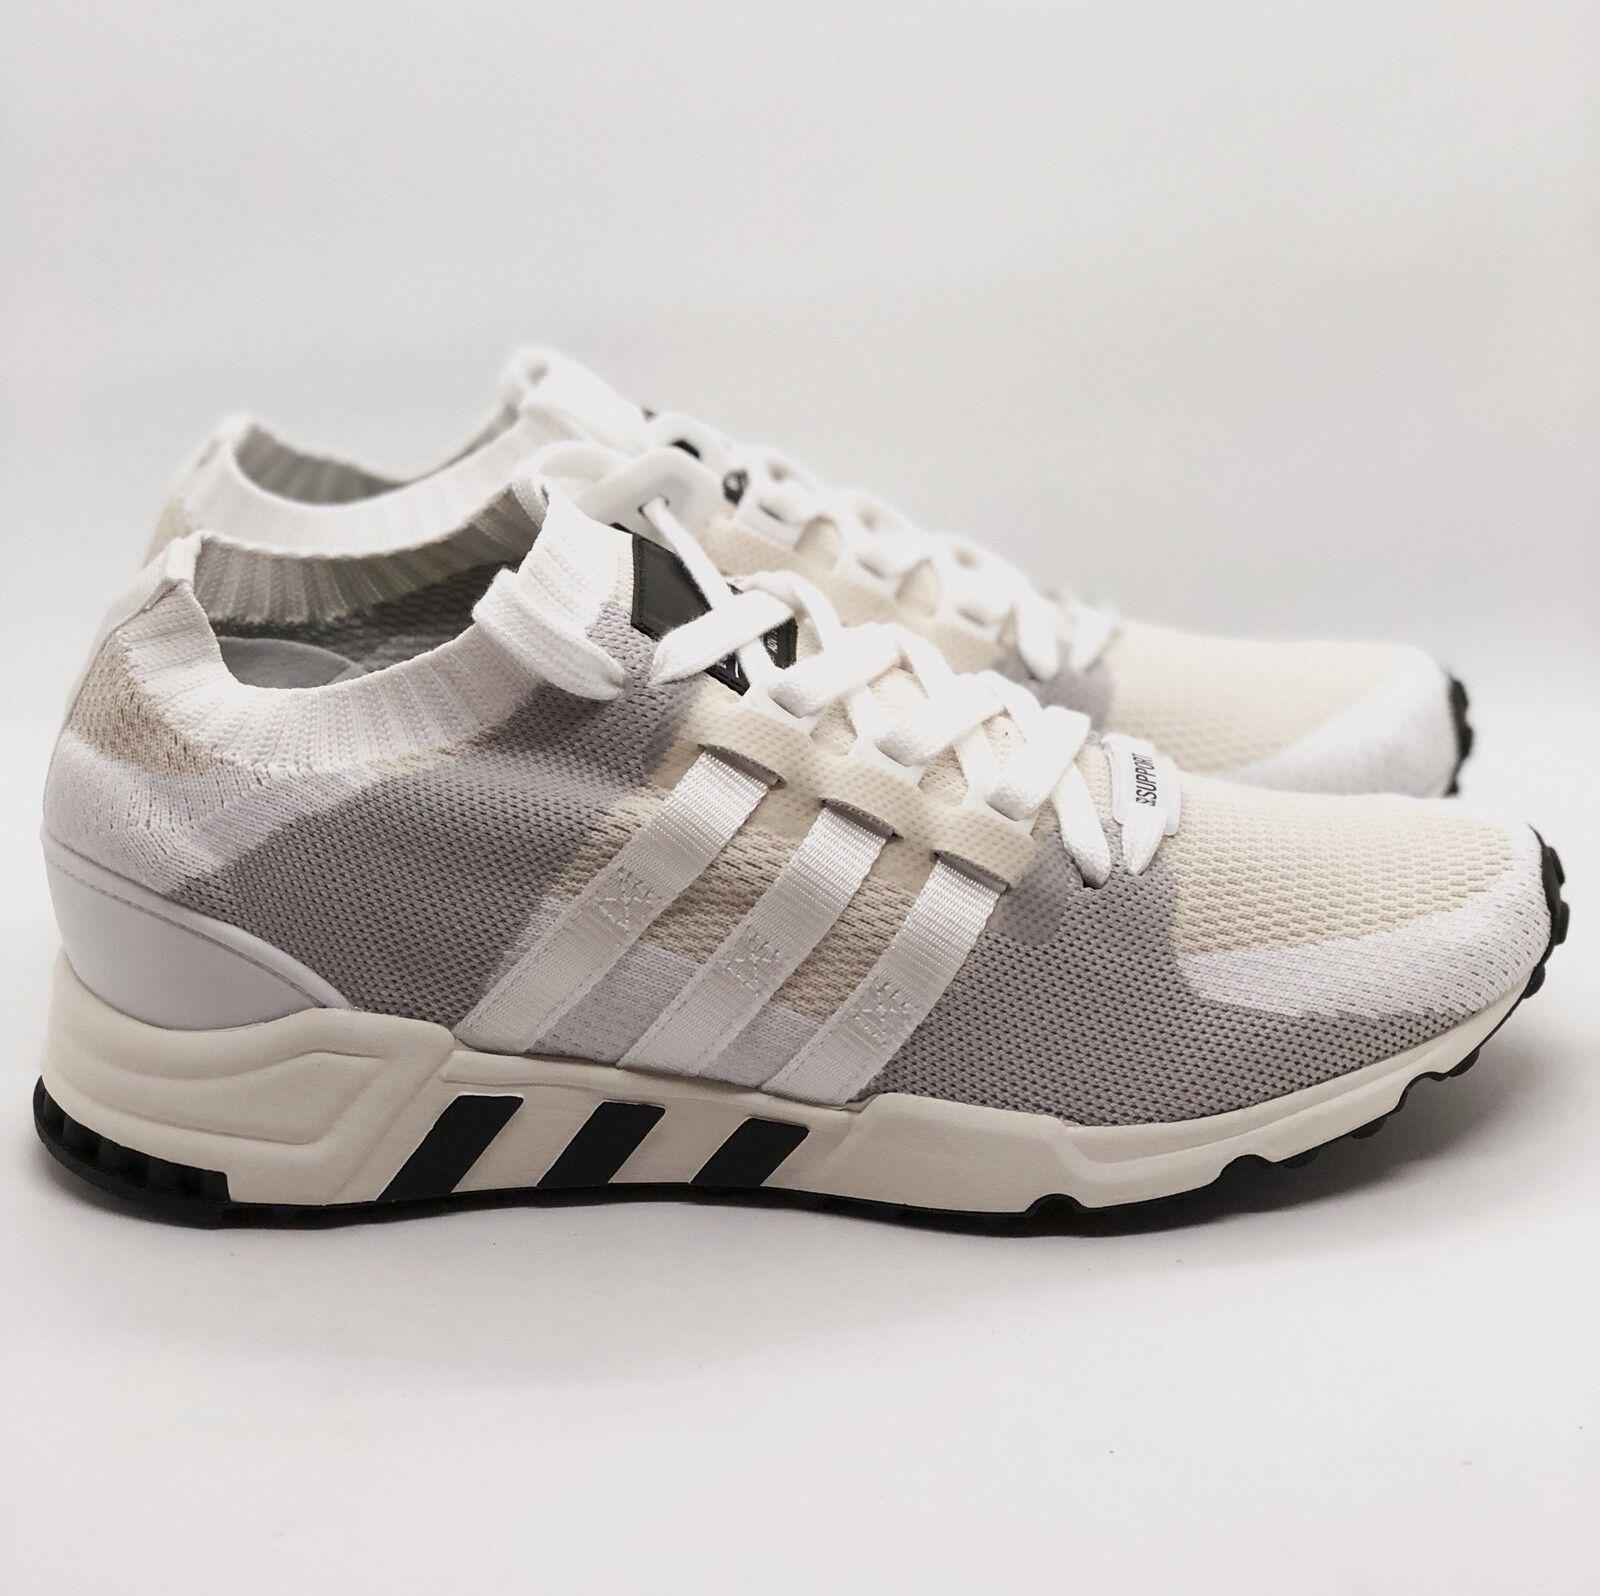 Adidas EQT SUPPORT RF PK (BA7507) Men's 8.5 Sneaker Size 8.5 Men's White/ Black/ Off White 1bb175